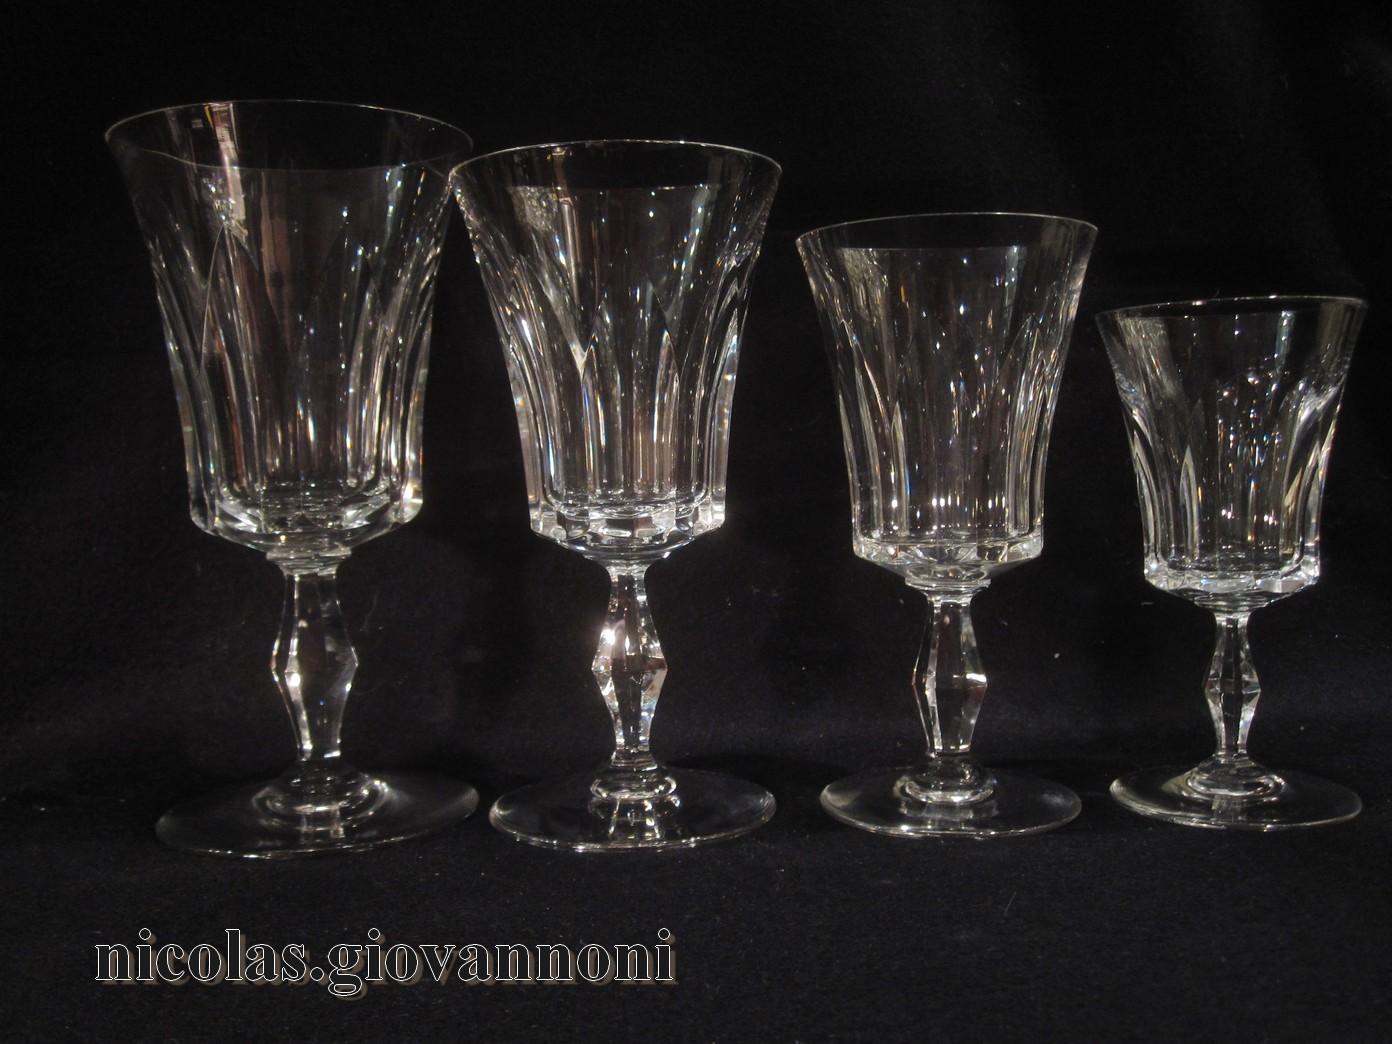 48 verres 2 carafes 1 broc polignac baccarat cristal catalogue cristal de france. Black Bedroom Furniture Sets. Home Design Ideas